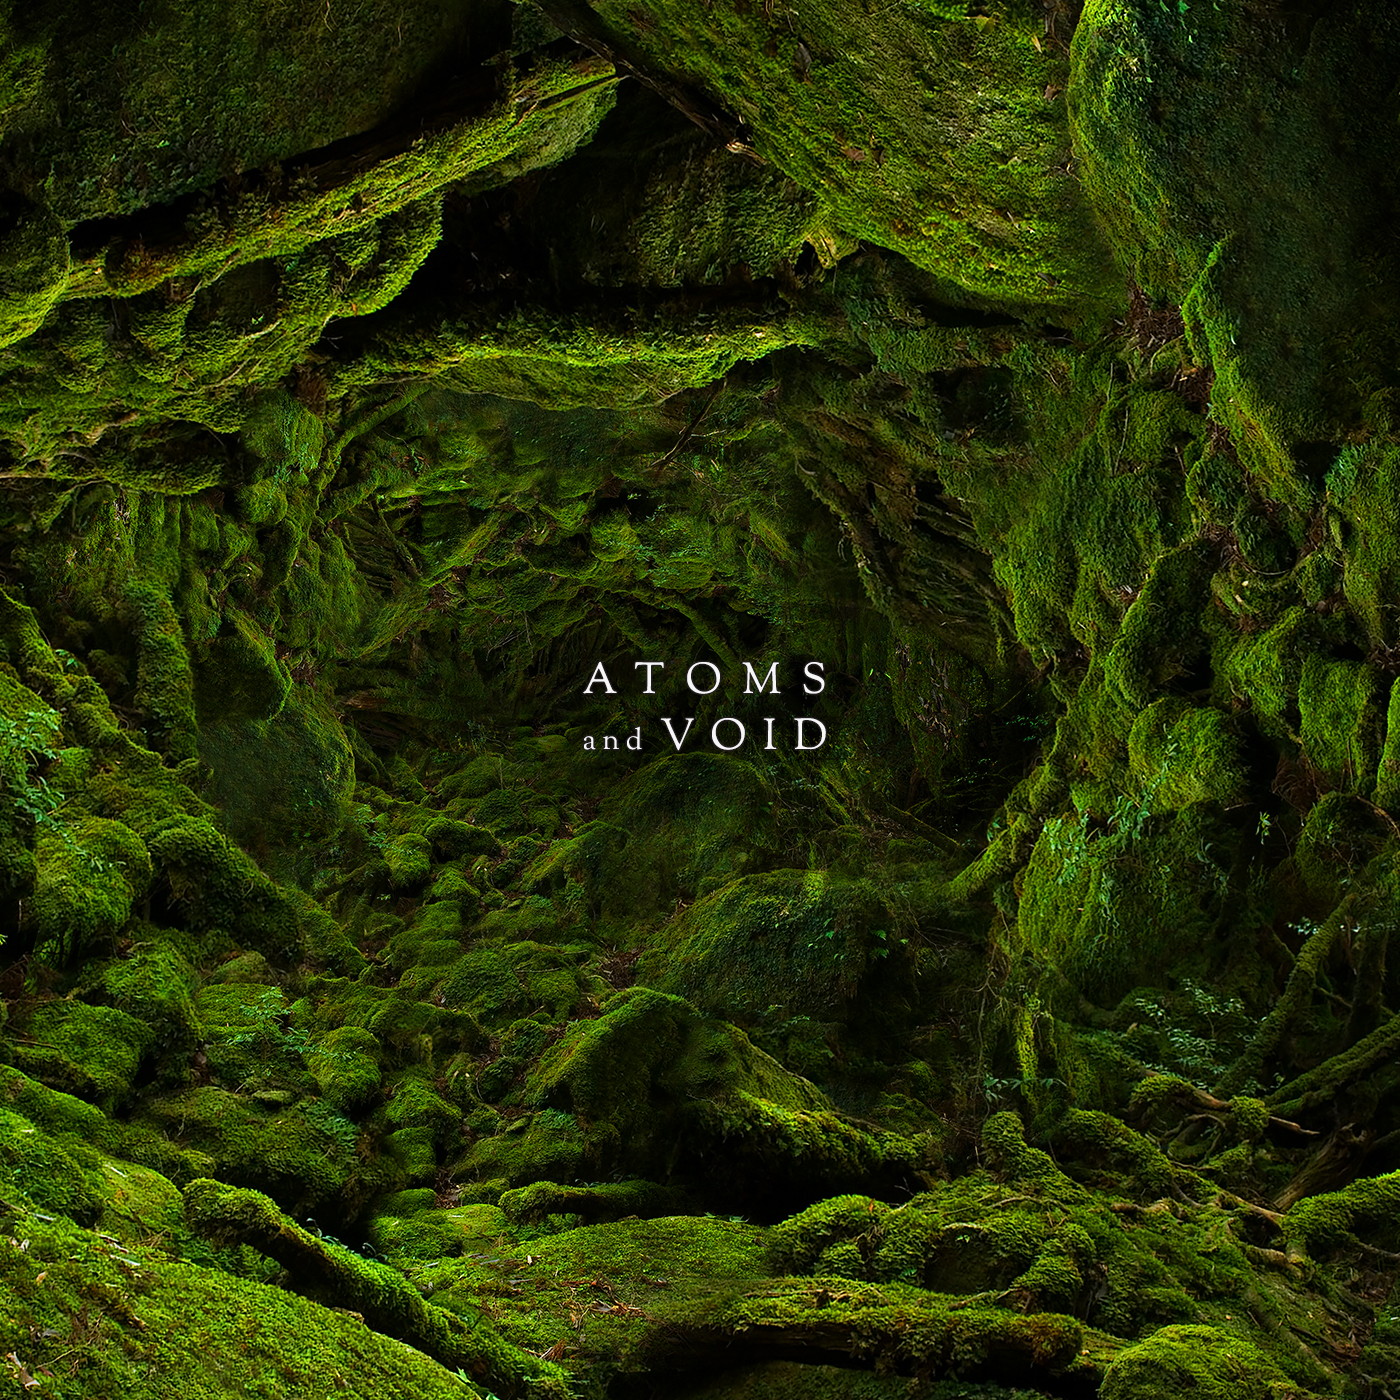 atomsandvoid_andnowhereelse.jpg